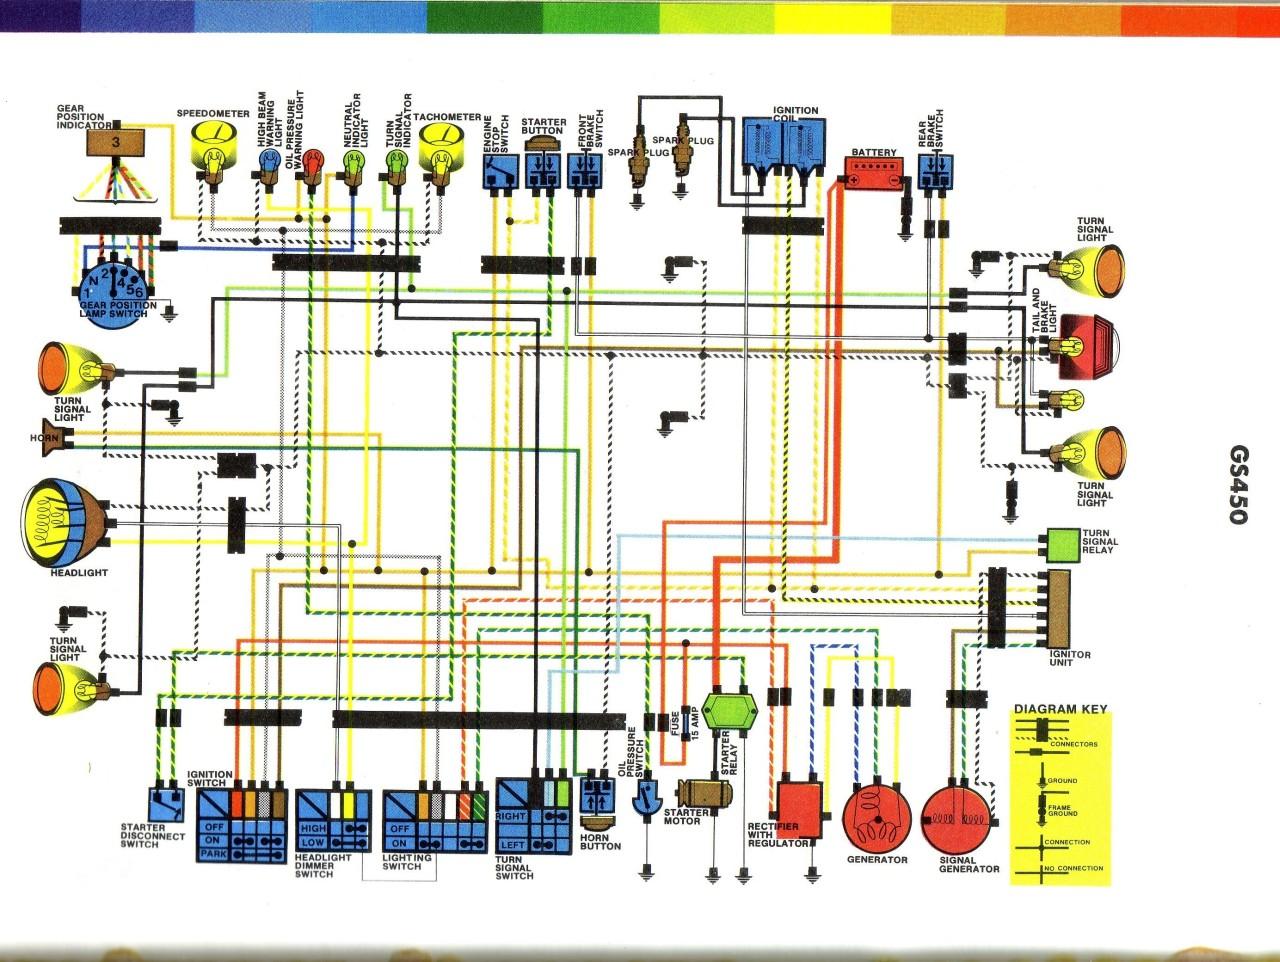 medium resolution of gs450 wiring diagram gs450lie gs550 wiring diagram gs450 wiring diagram